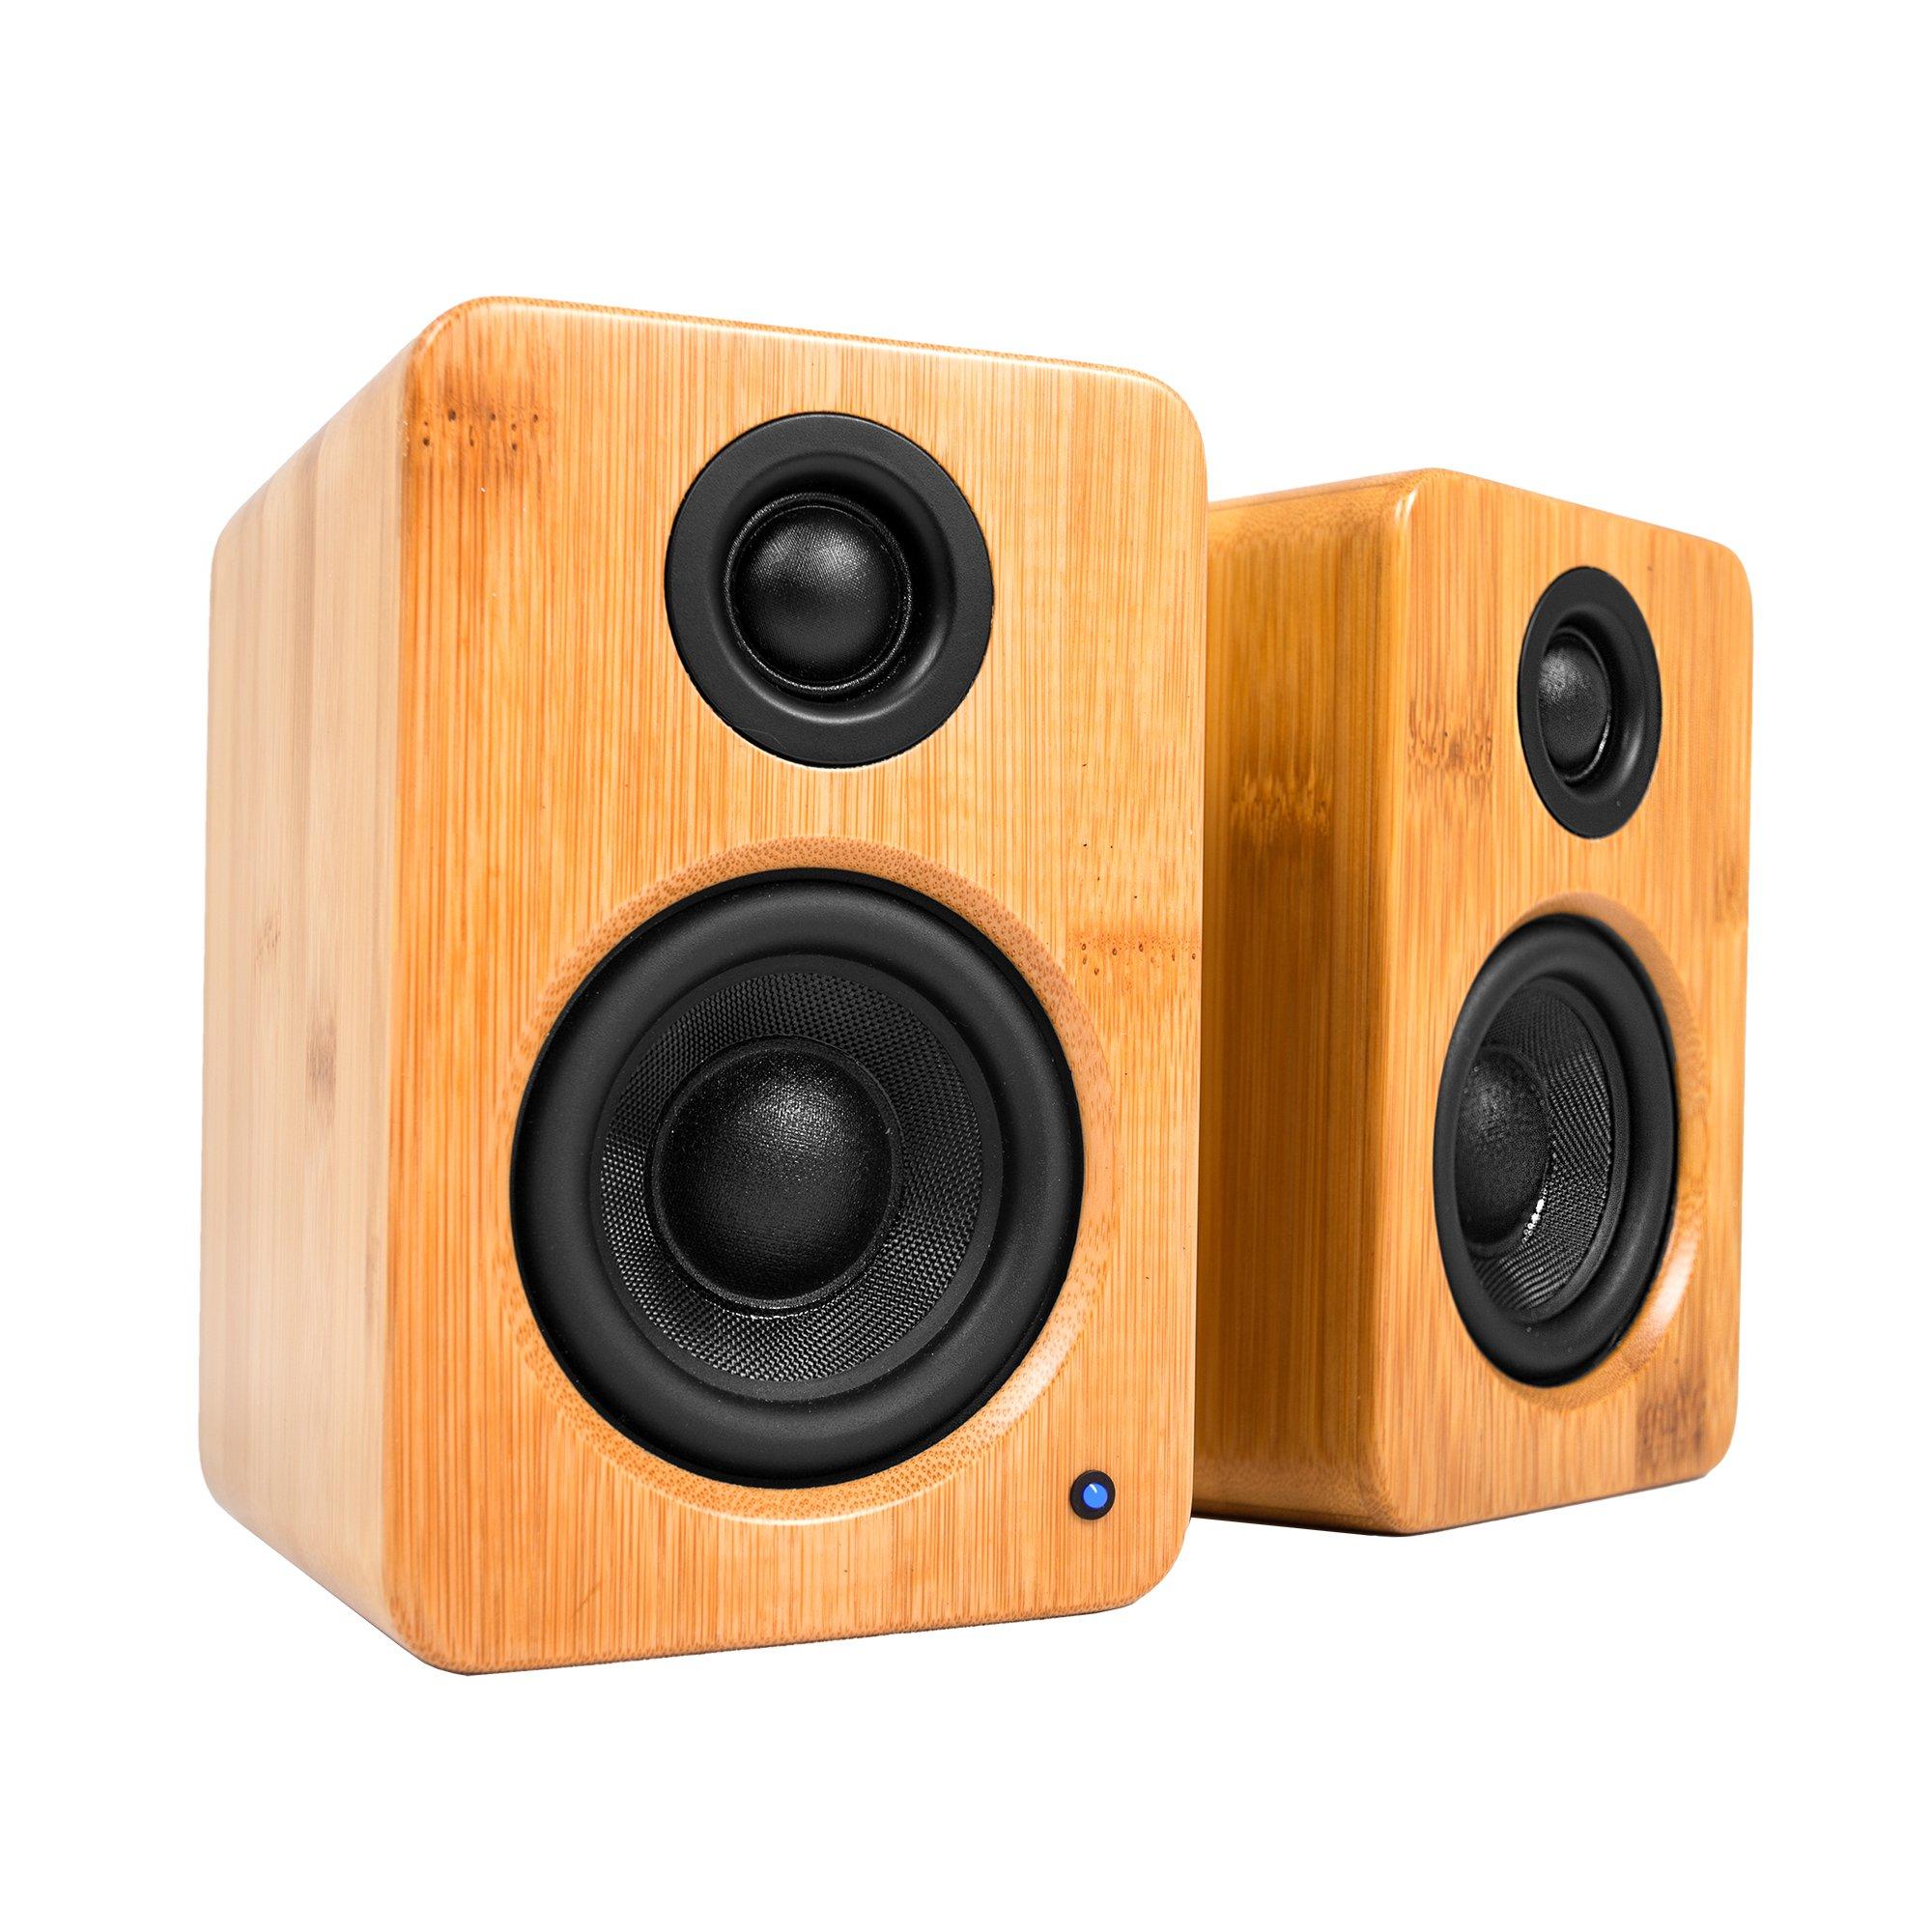 Kanto YU2 Powered Desktop Speakers – 3'' Composite Driver 3/4'' Silk Dome Tweeter – Bamboo